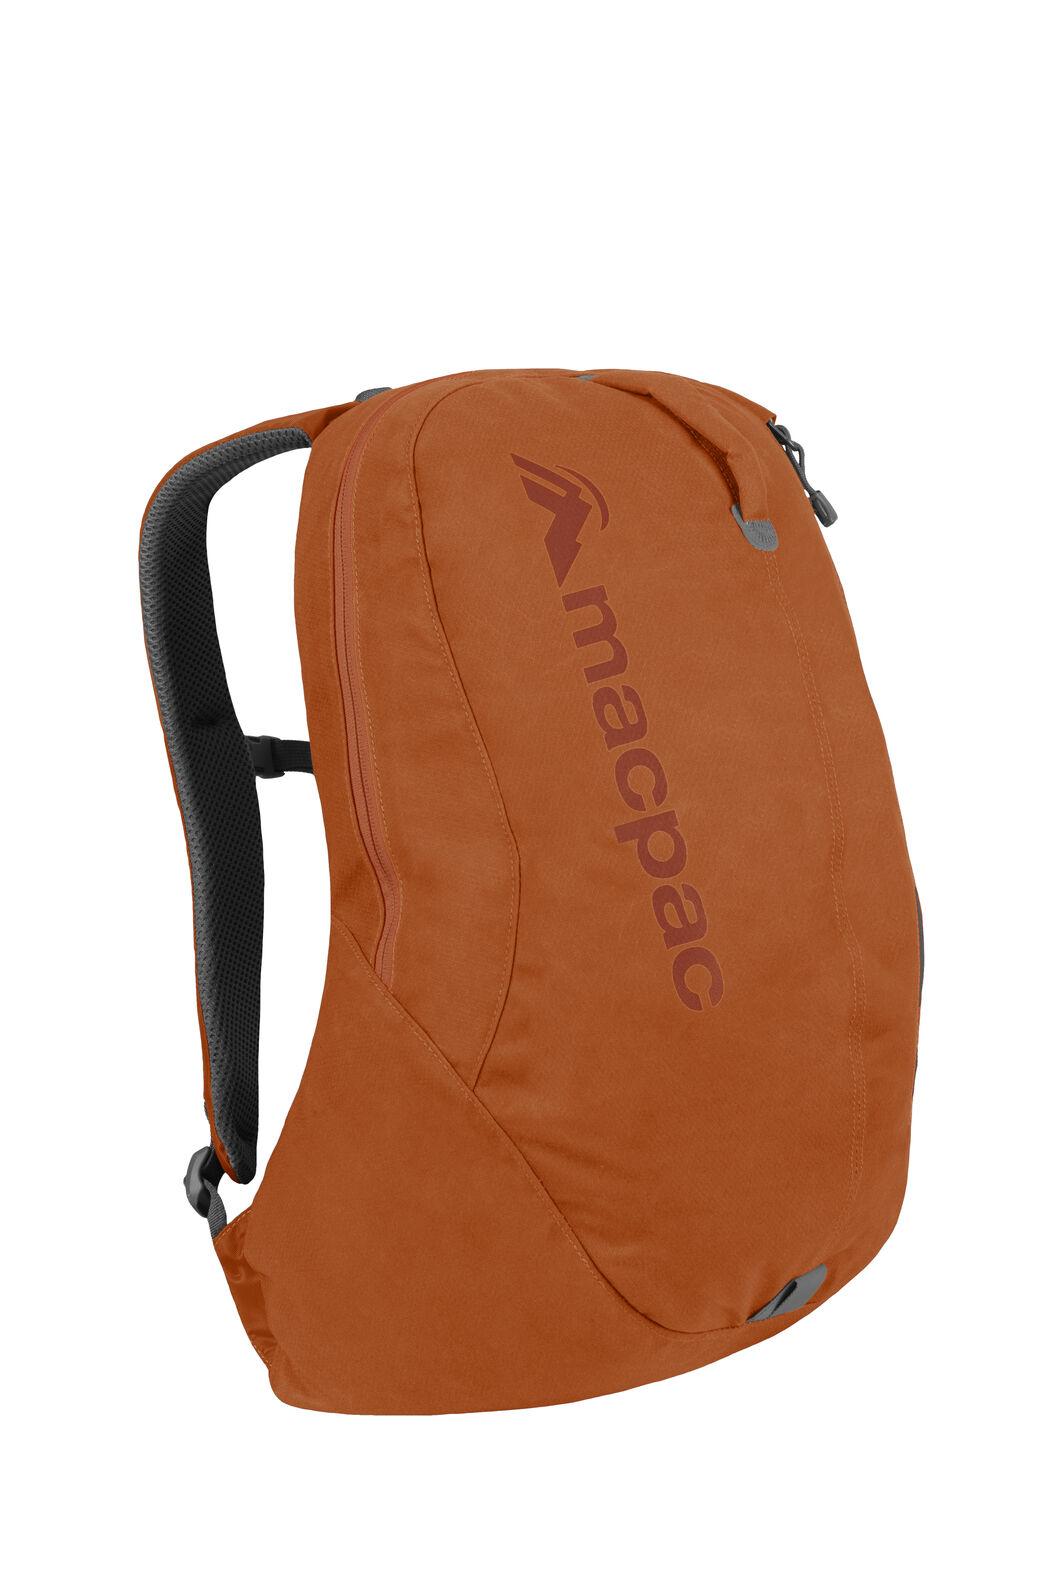 Macpac Kahu 22L AzTec® Backpack, Marmalade, hi-res